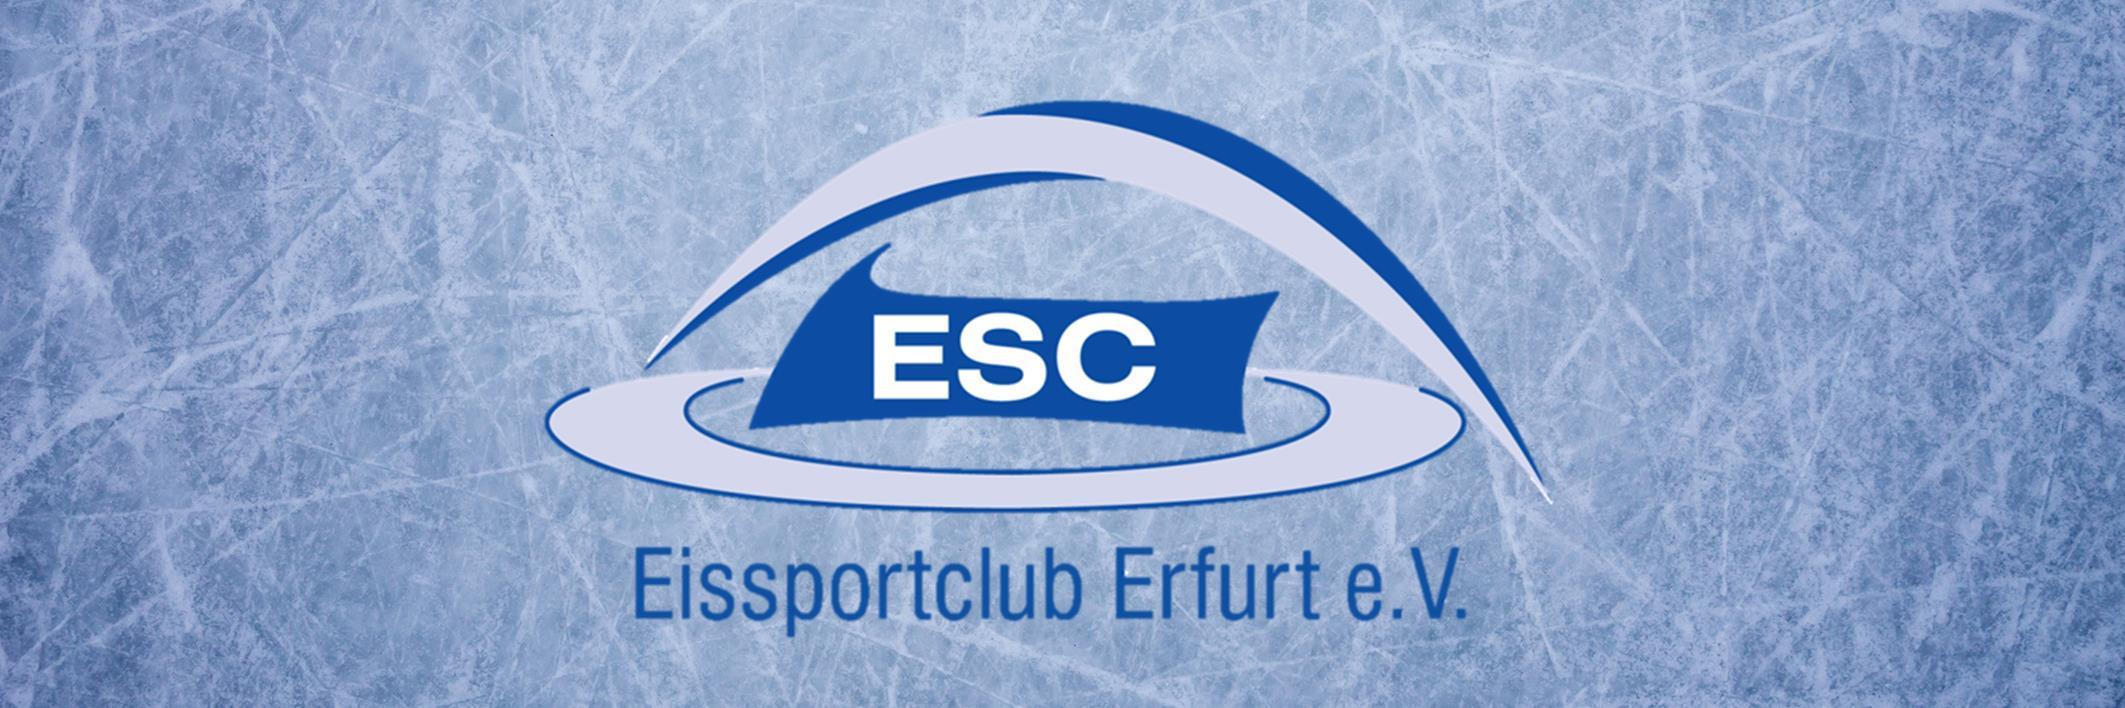 Eissportclub Erfurt e.V.